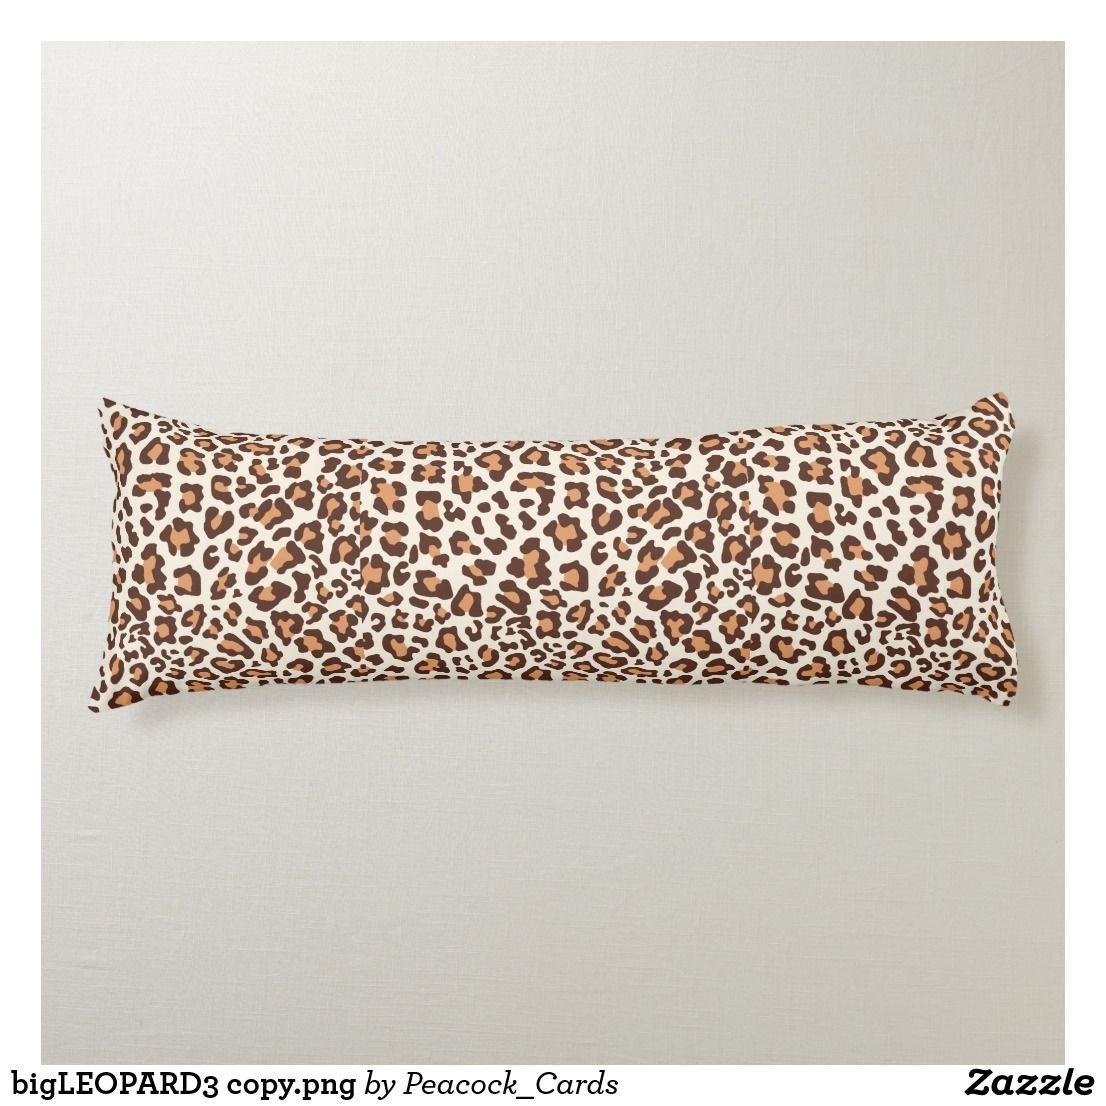 Bigleopard3 Copy Png Body Pillow Zazzle Com Body Pillow Pillows Print Design Pattern